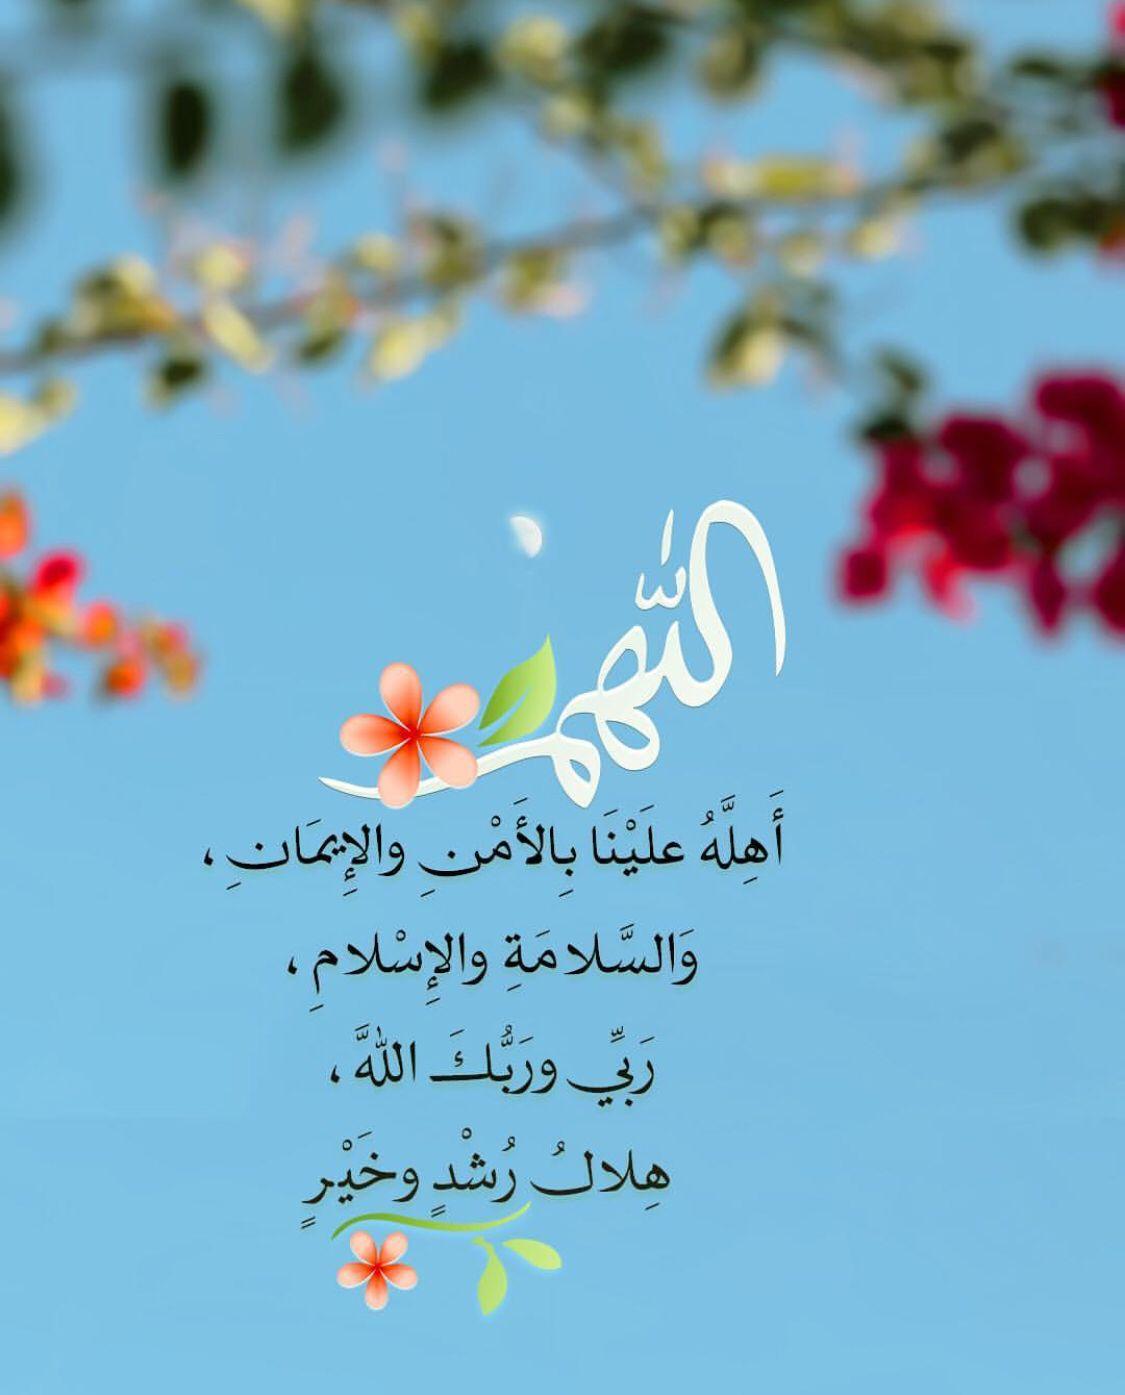 Pin By صورة و كلمة On رمضان كريم Ramadan Kareem Islamic Pictures Ramadan Ramadan Kareem